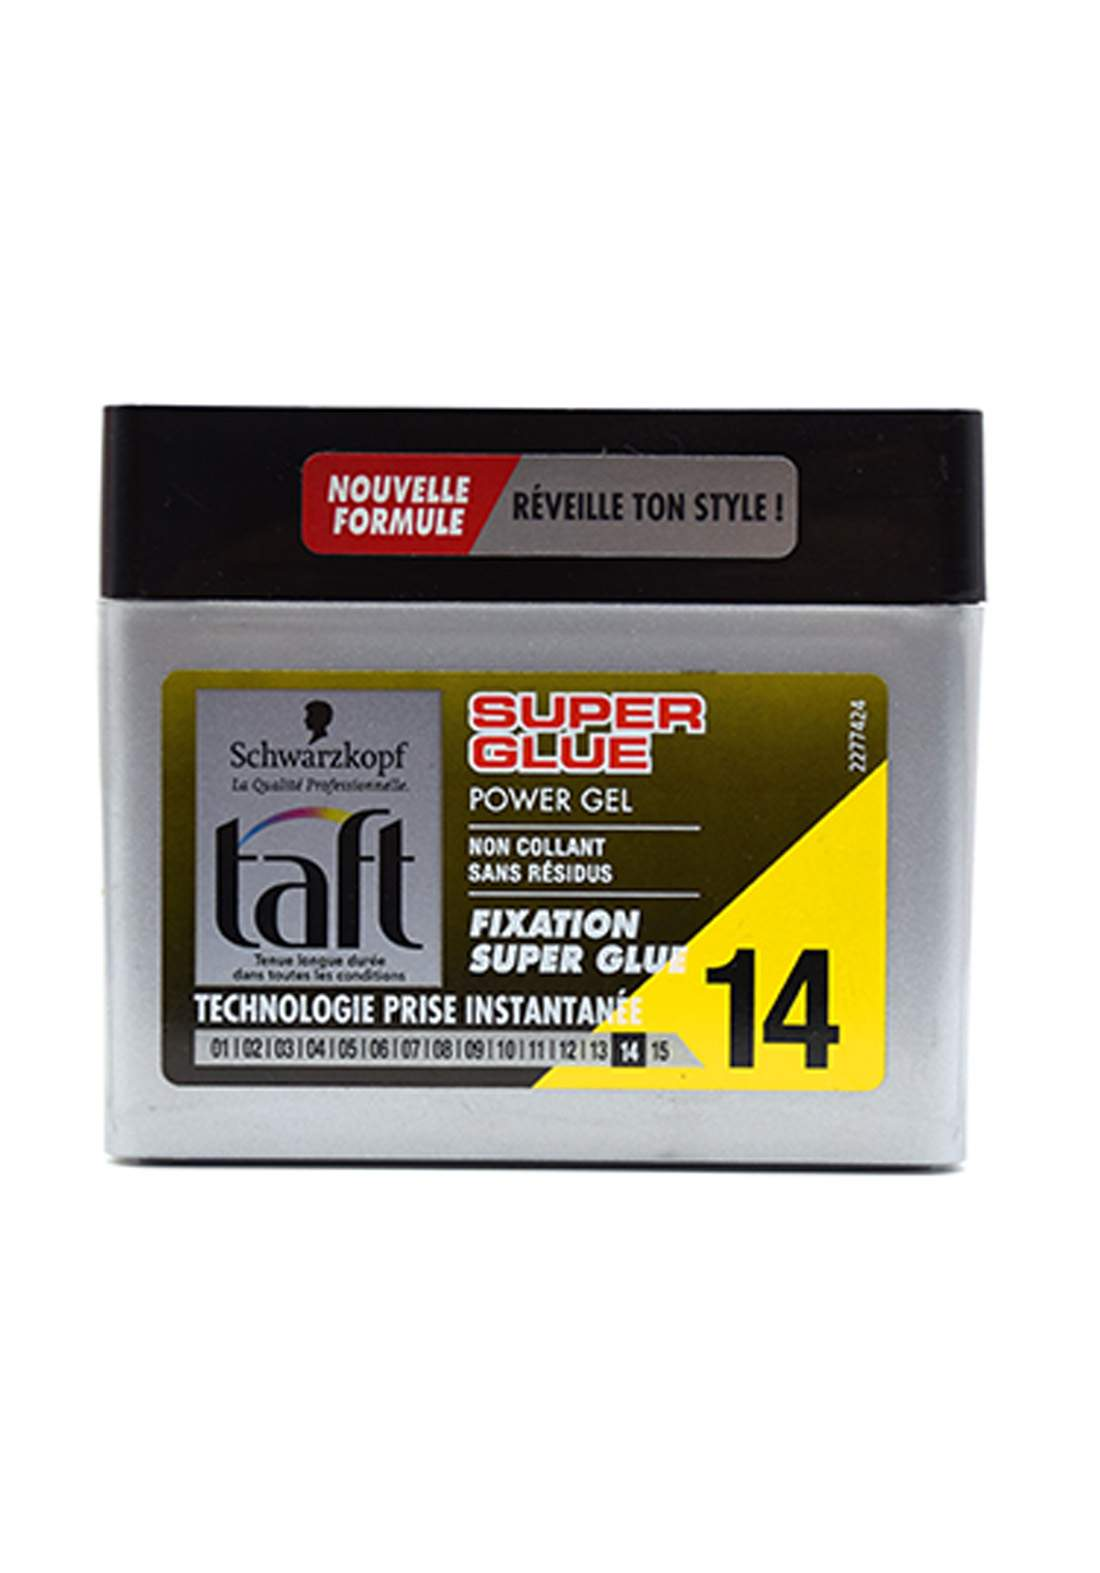 Schwarzkopf Taft Power Gel 14 - Super Glue - 250ml جل للشعر